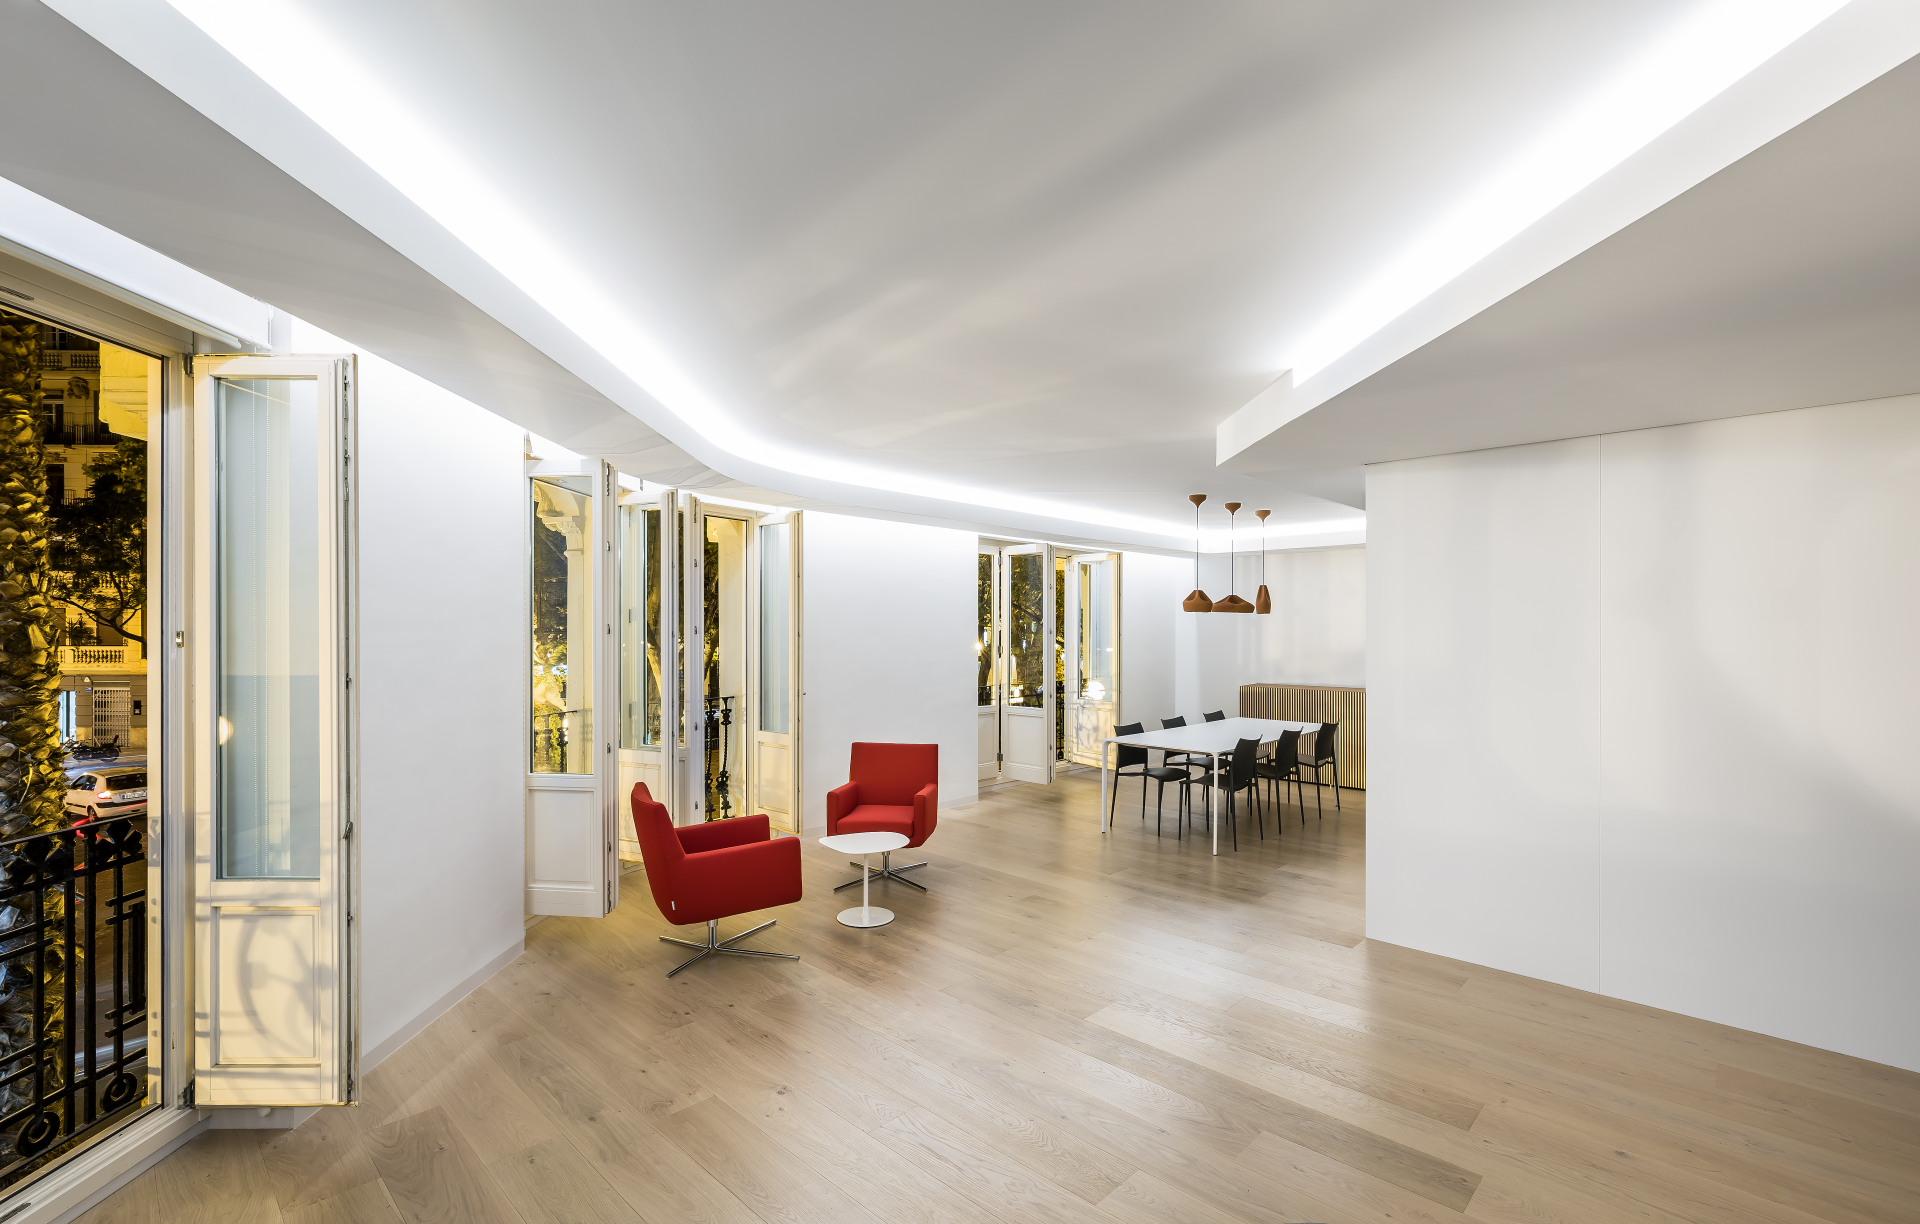 fotografia-arquitectura-interiorismo-valencia-german-cabo-gallardo-llopis-bfm-edificatoria-turia02 (21)